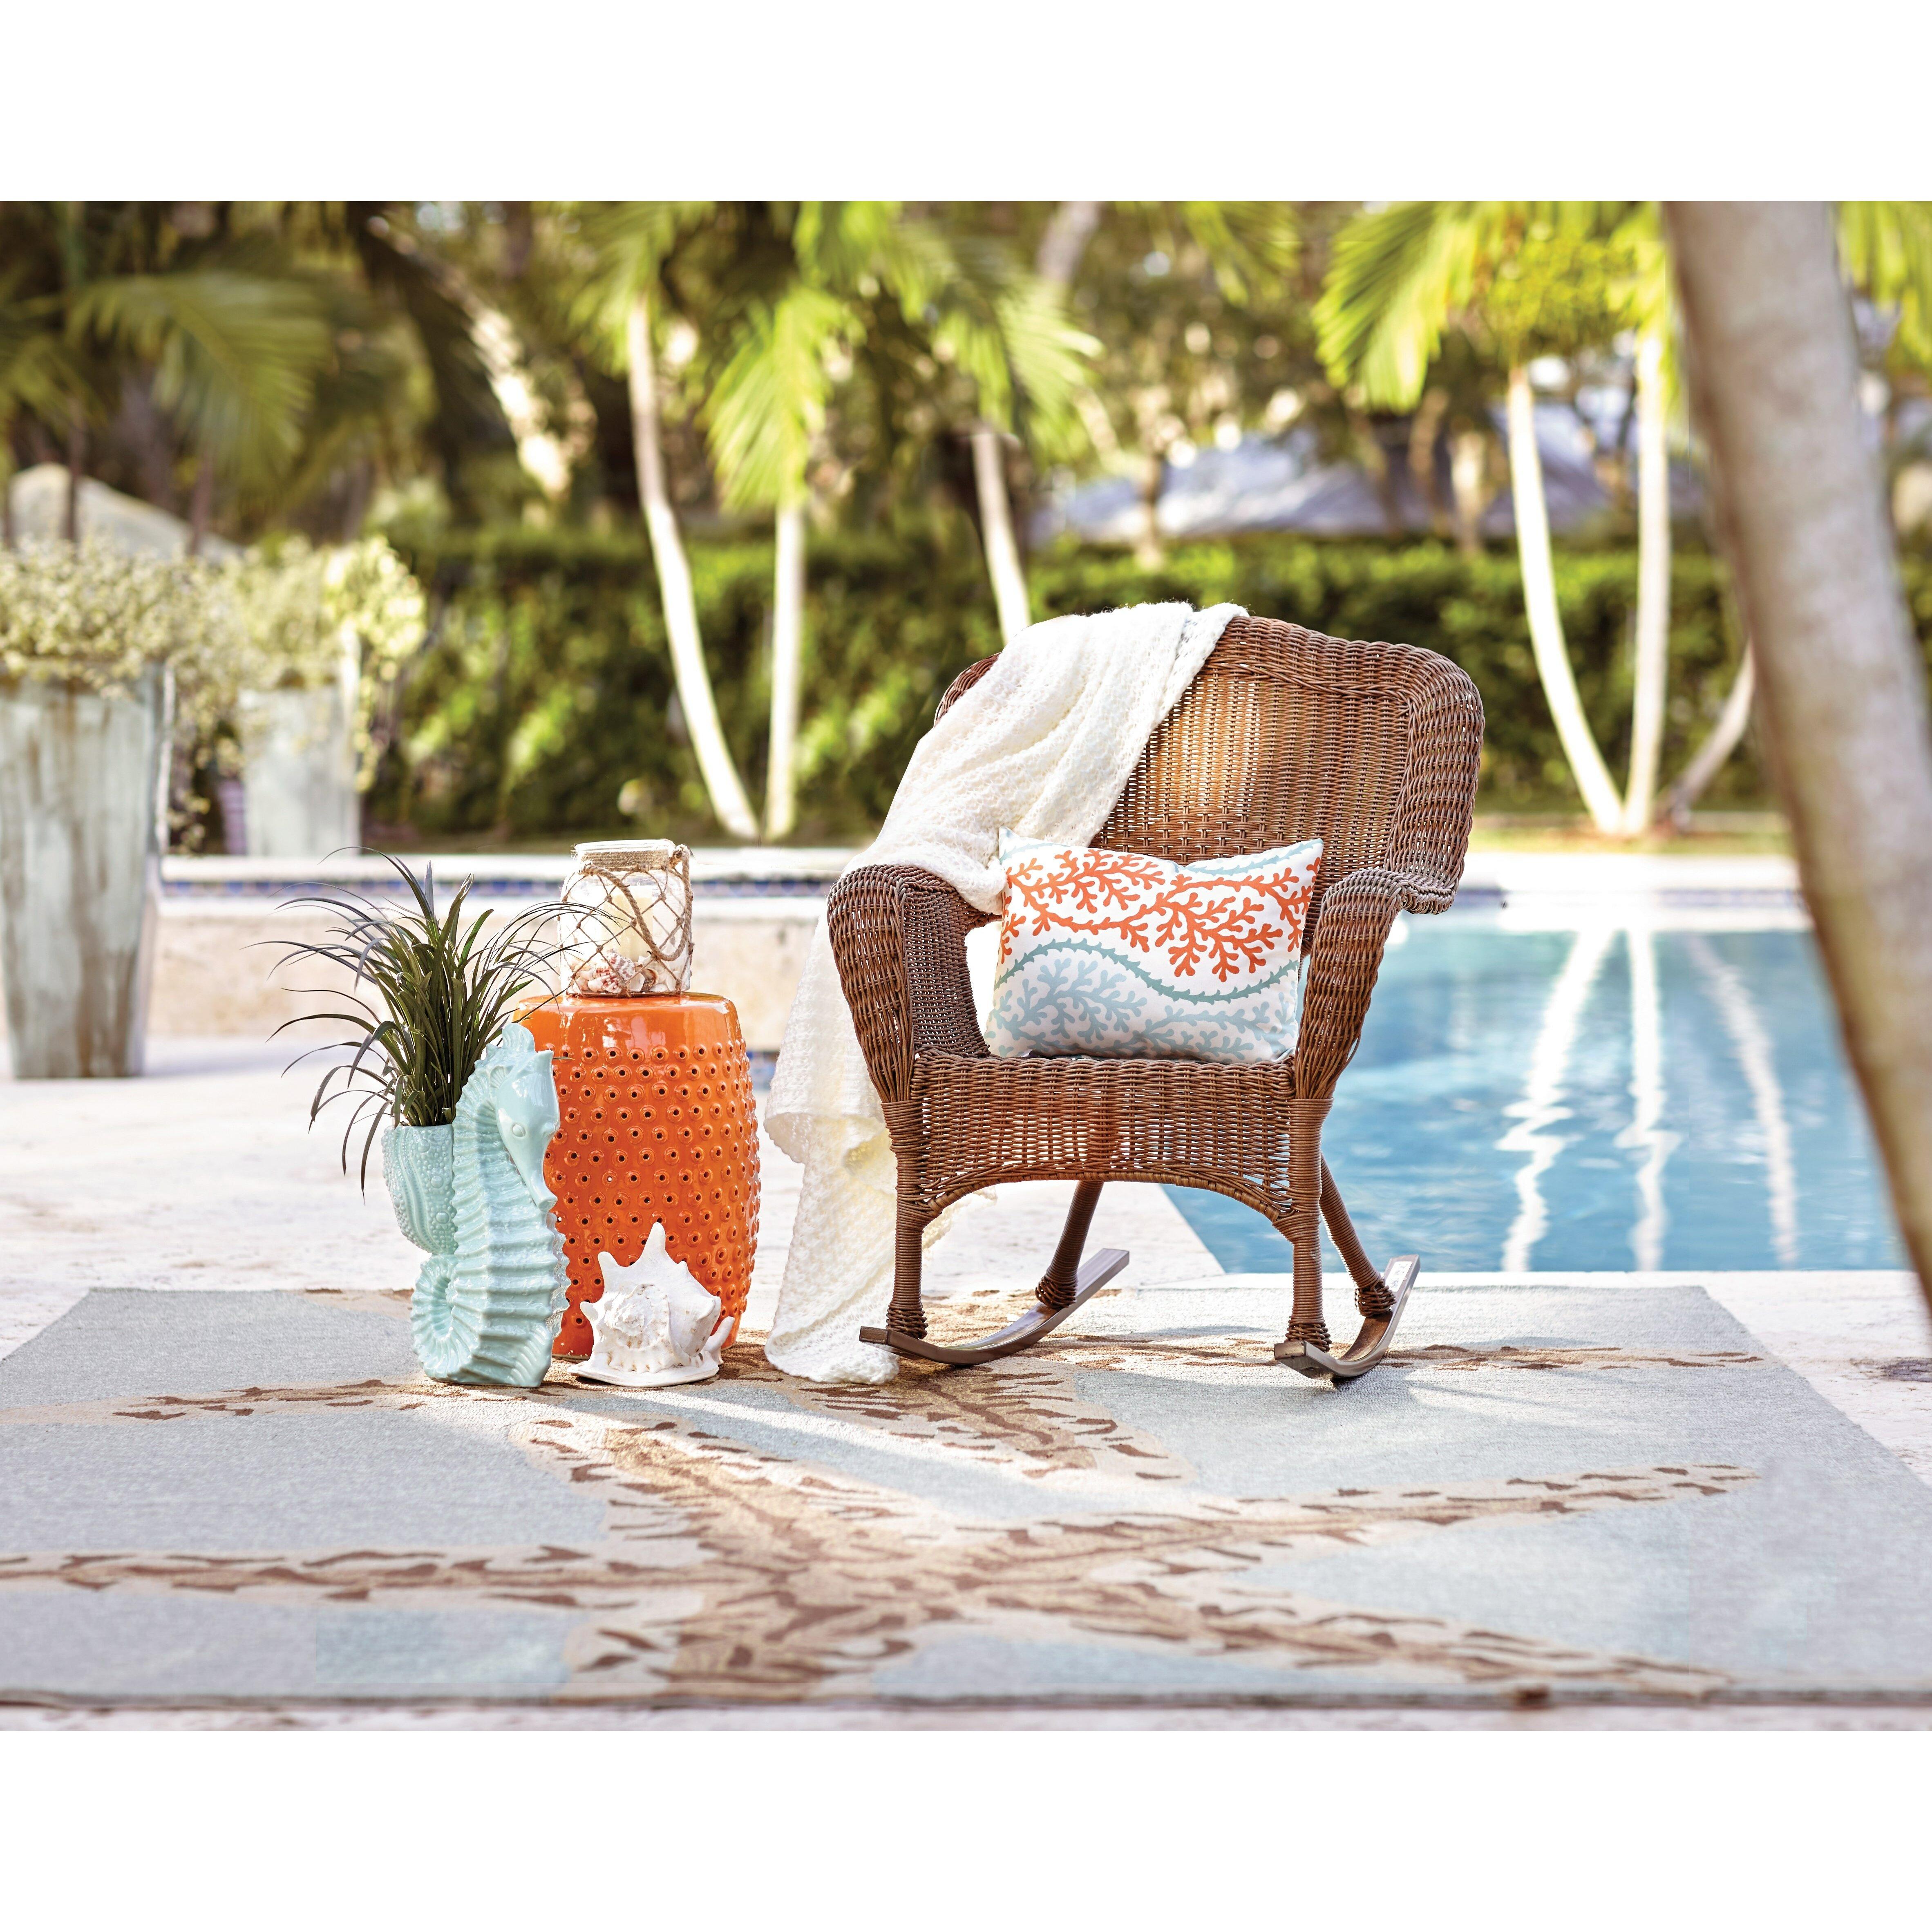 Sarasota Outdoor Kitchens: Beachcrest Home Lake Sarasota Coastal Indoor/Outdoor Throw